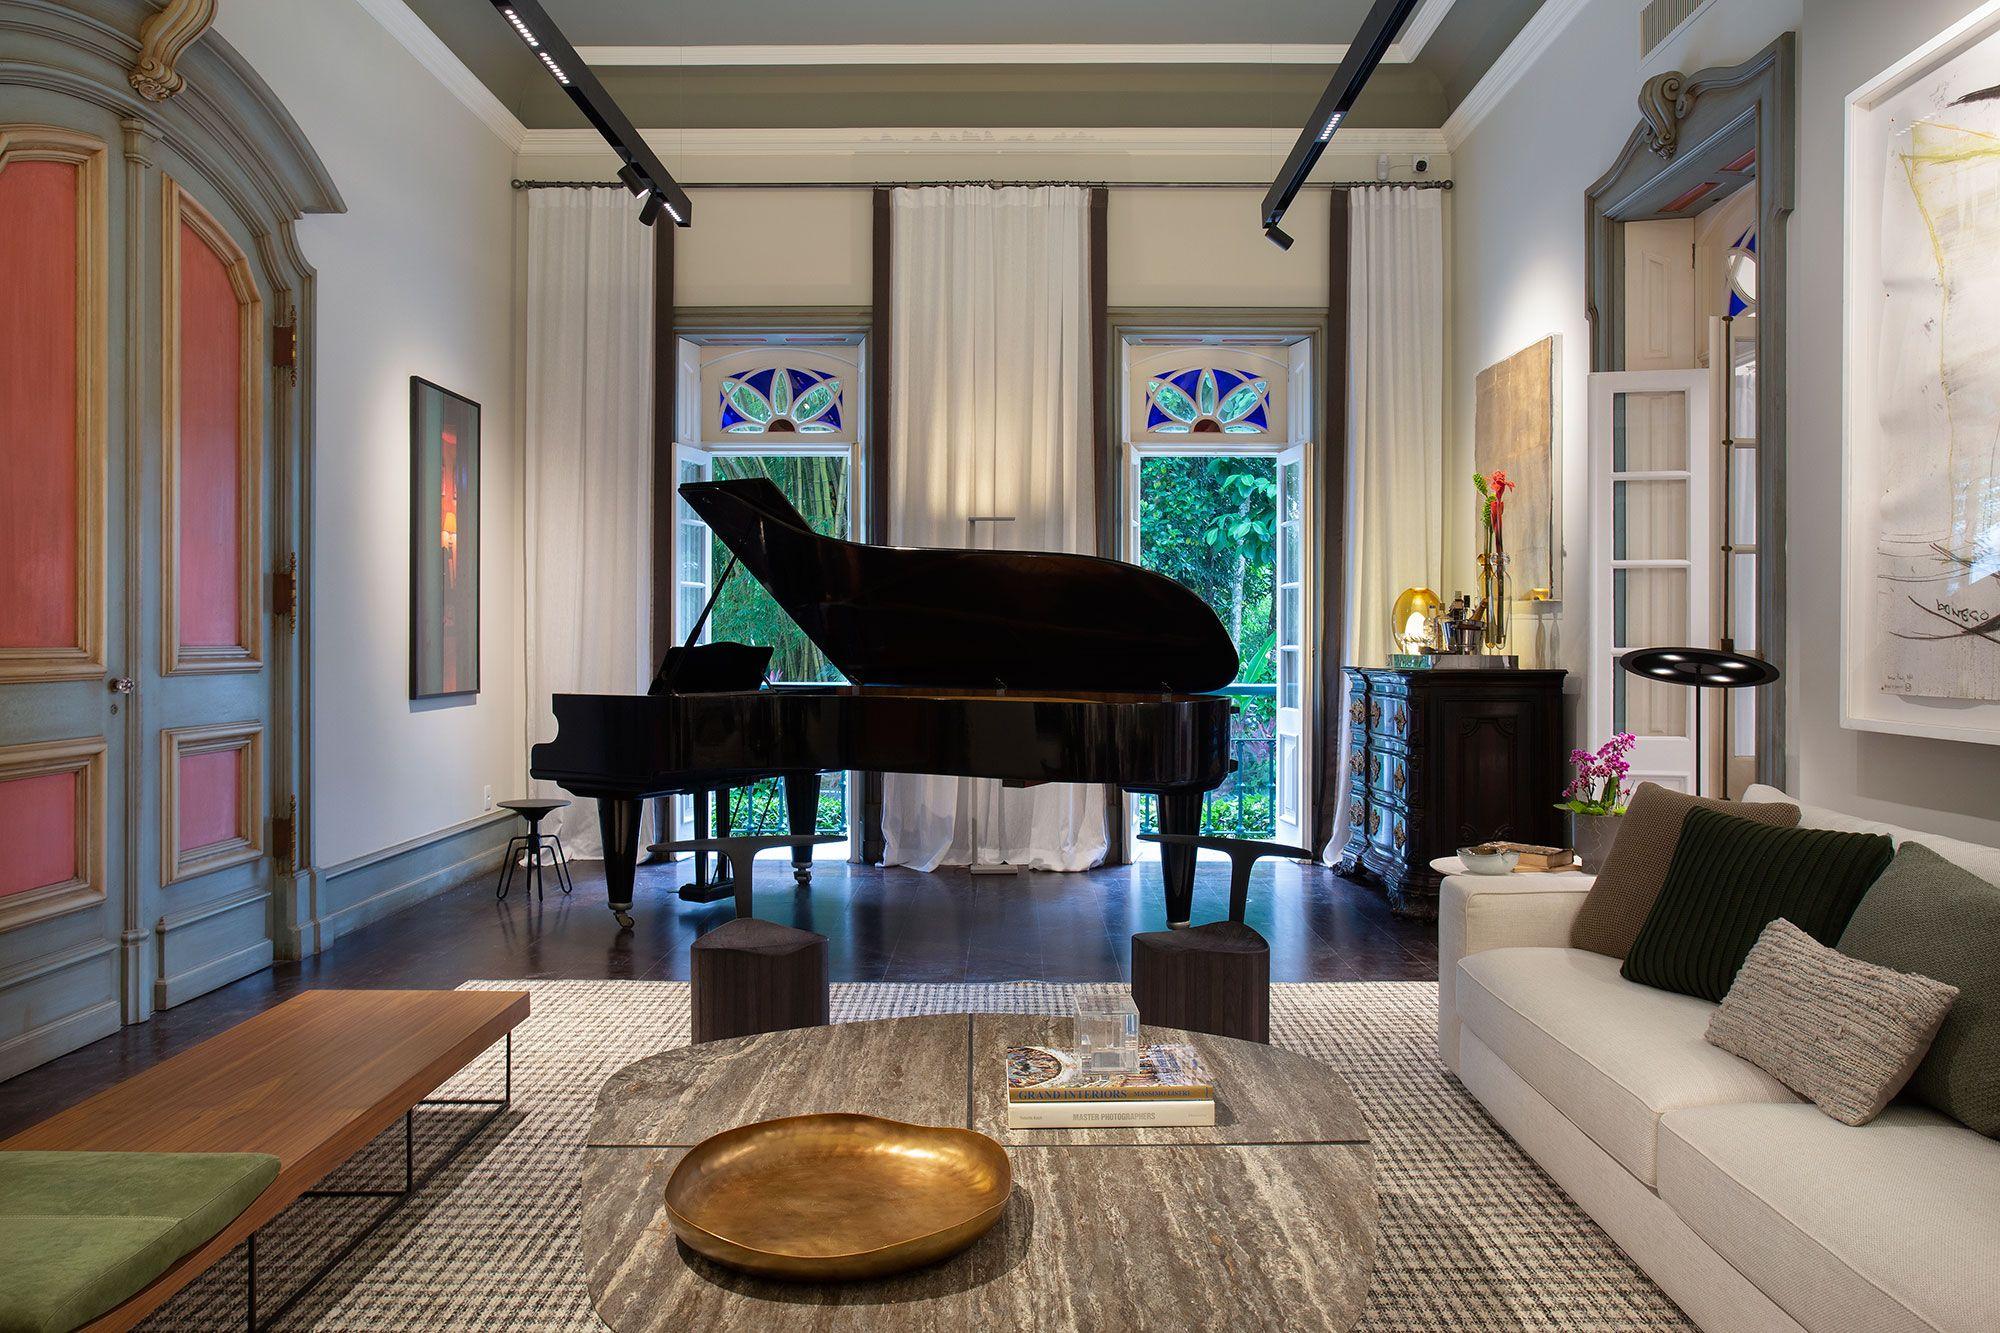 Sala do Piano. Ambiente de Luiz Fernando Grambowsky para a CASACOR Rio.